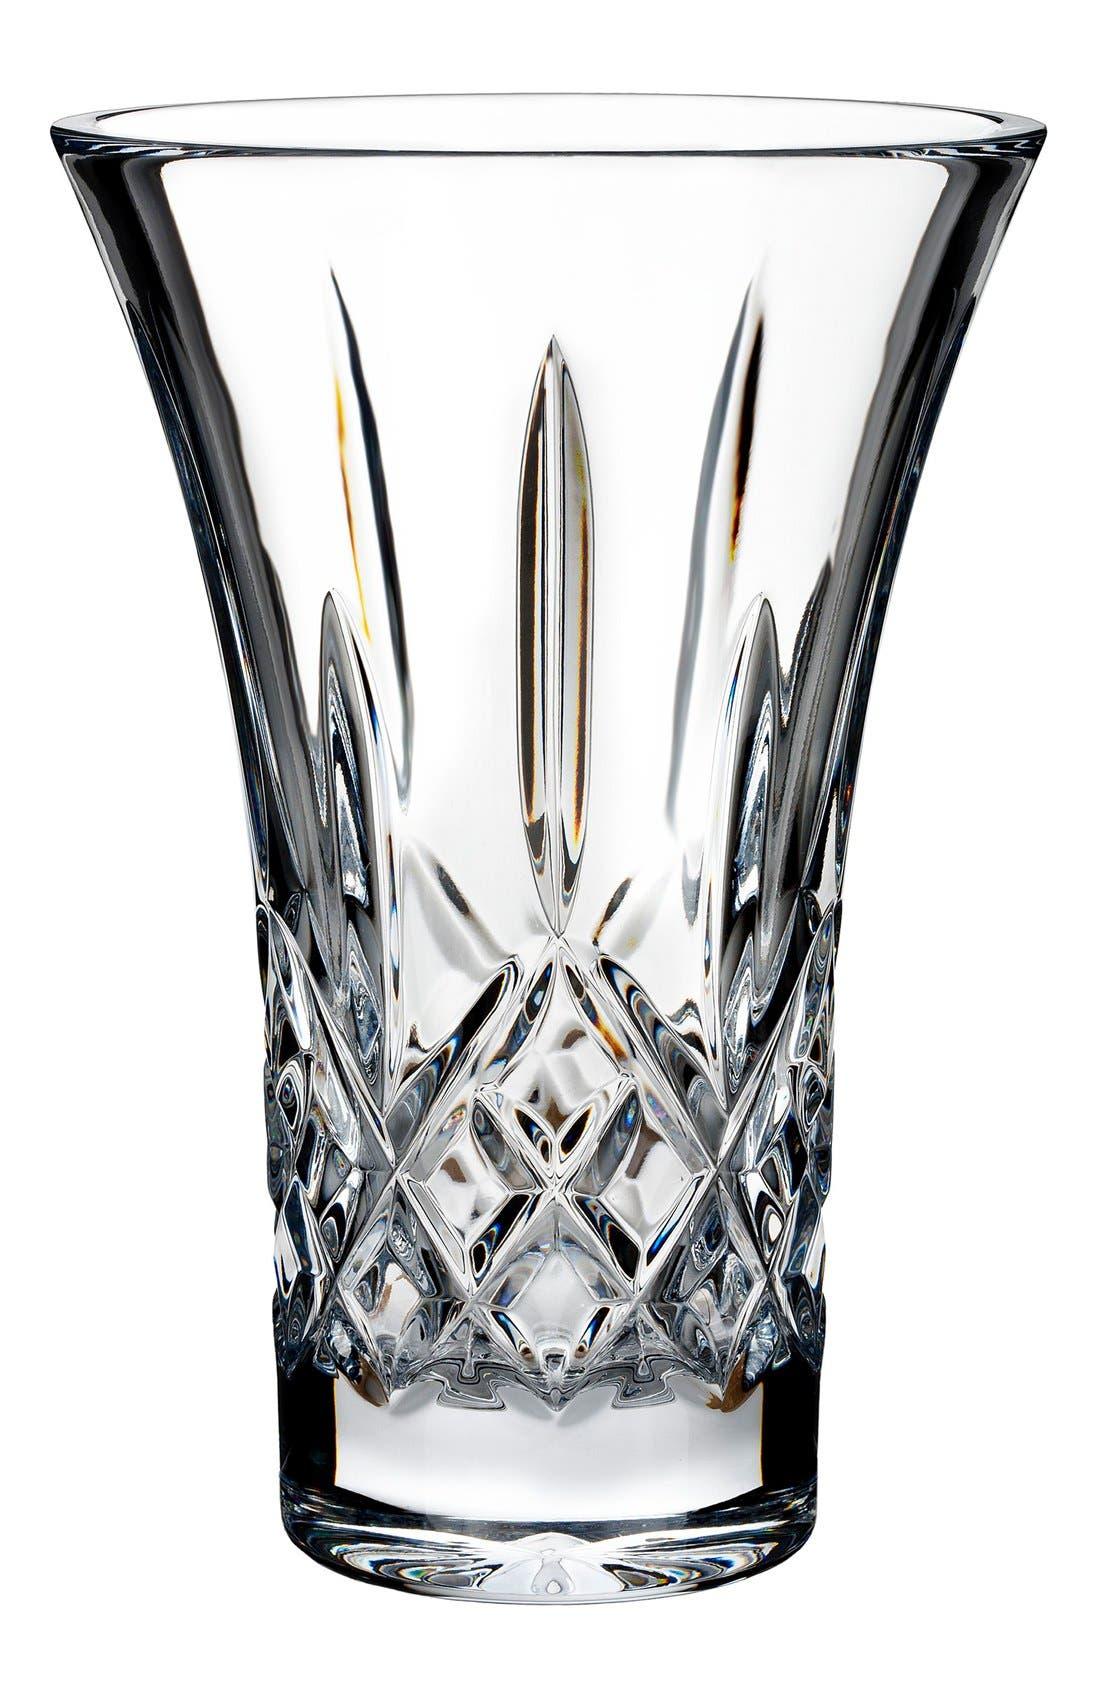 Main Image - Waterford 'Lismore' Lead Crystal Flared Vase